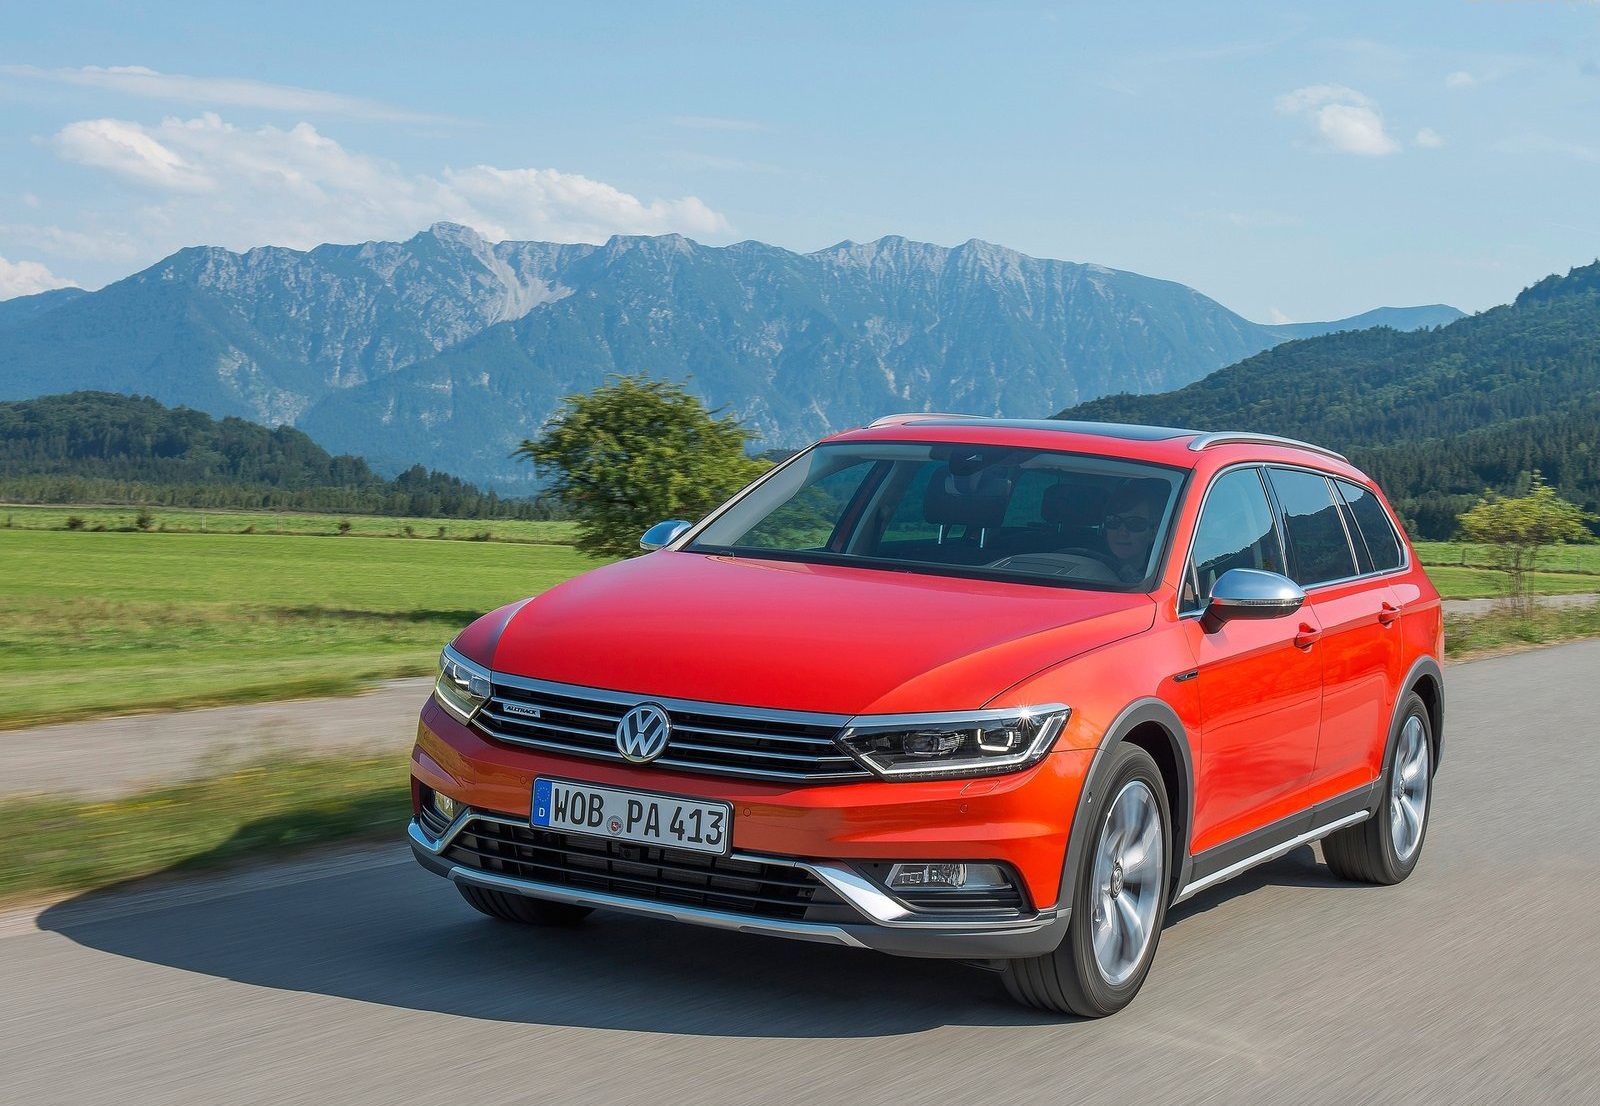 2016 Volkswagen Passat Alltrack Test Drive Photo